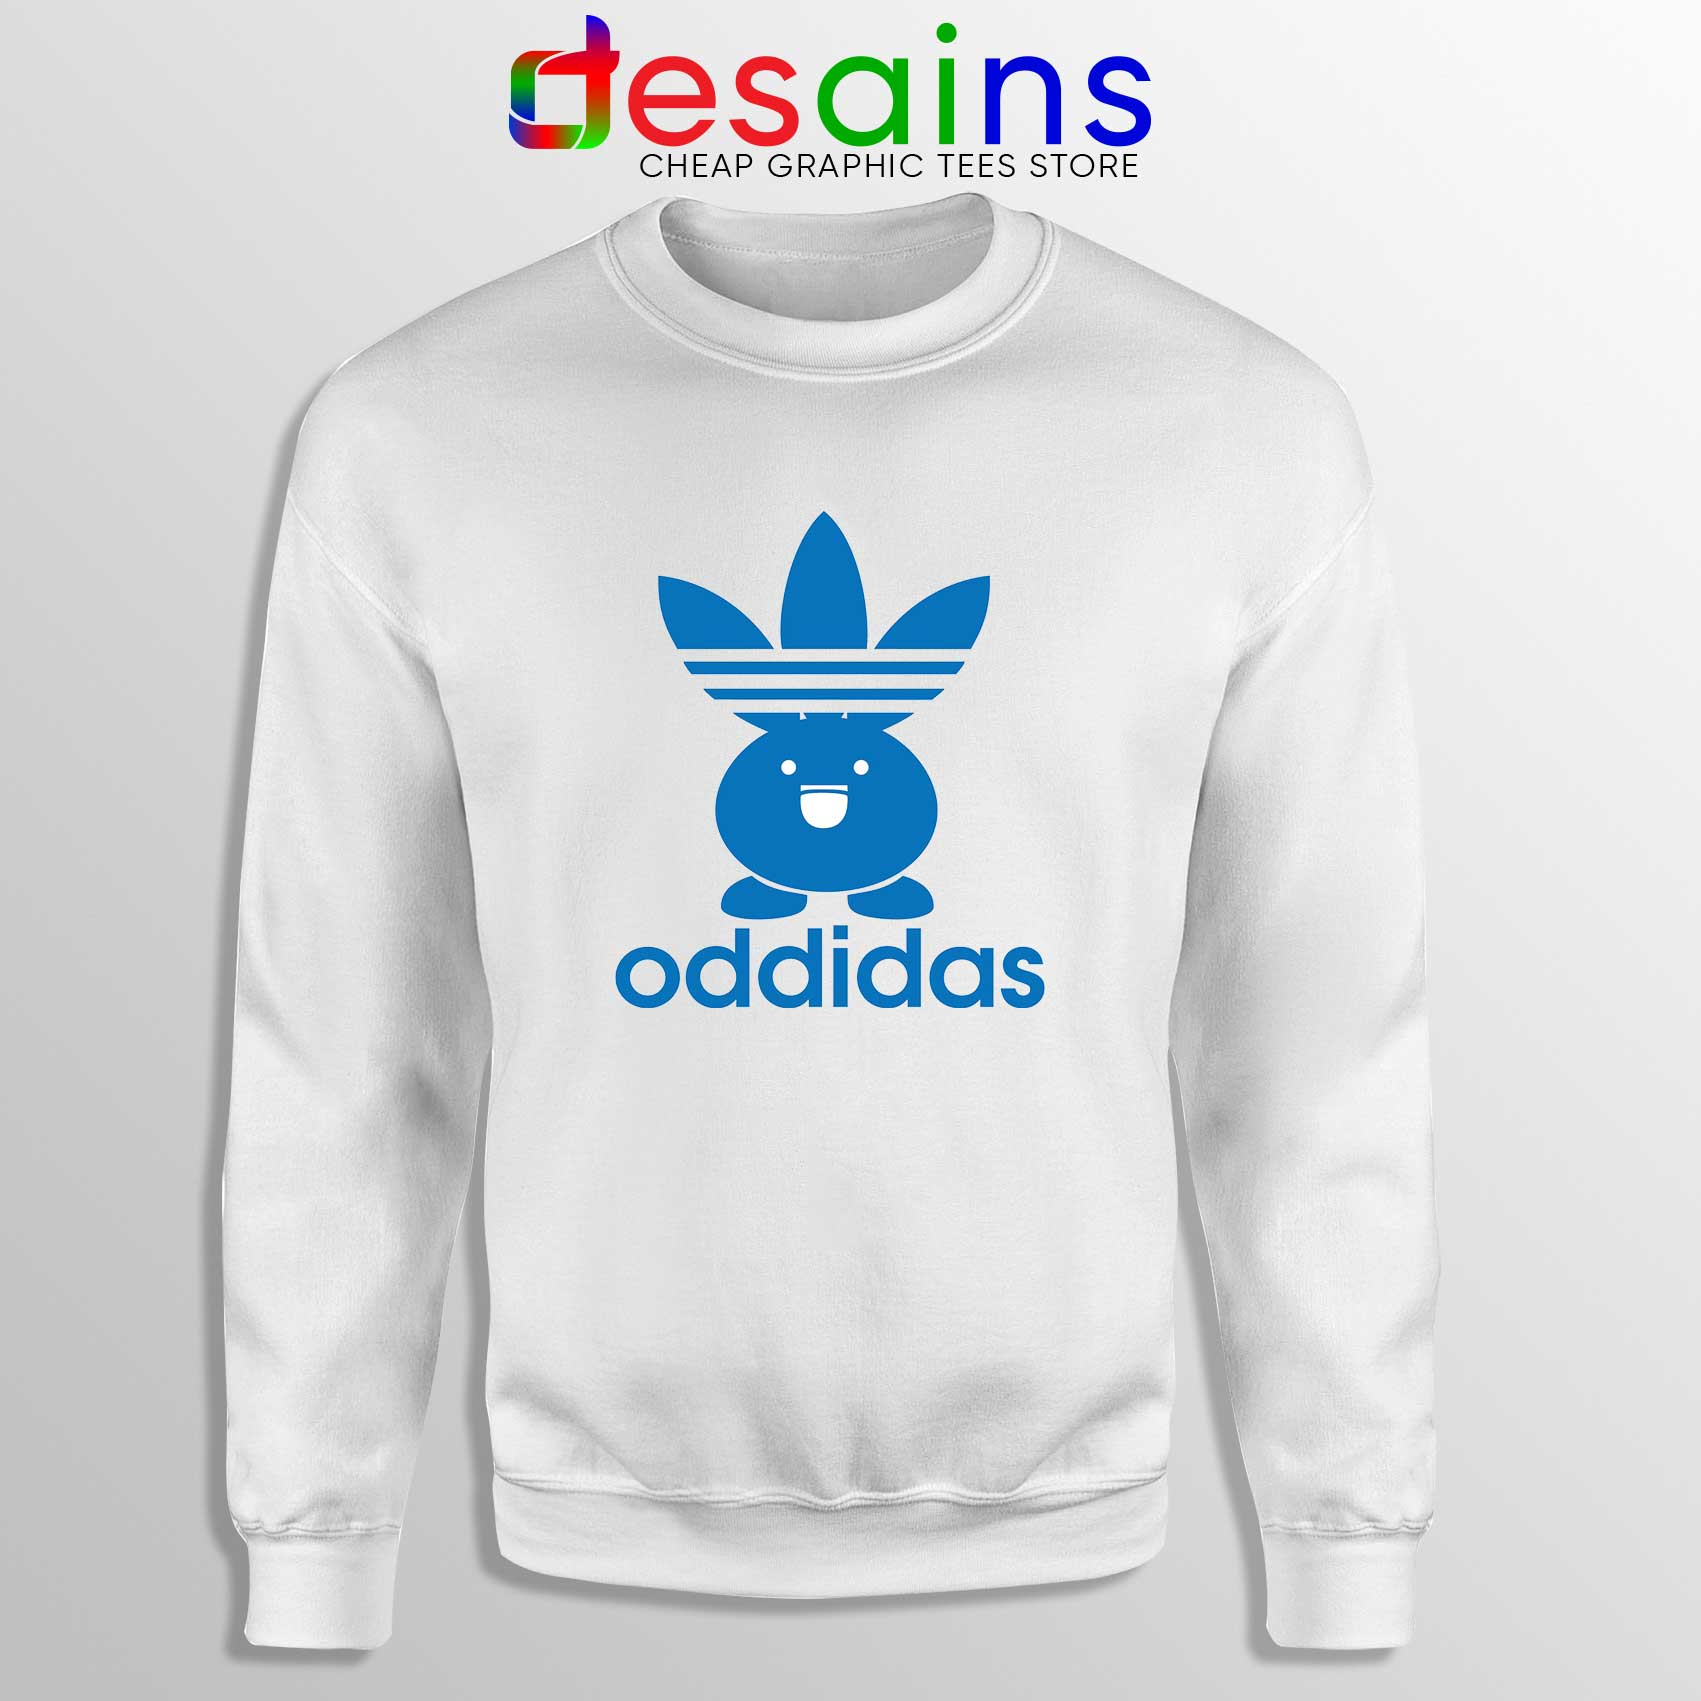 Sweatshirt Adidas Classic Sweater Cheap Oddidas Pokemon Oddish wN8m0n